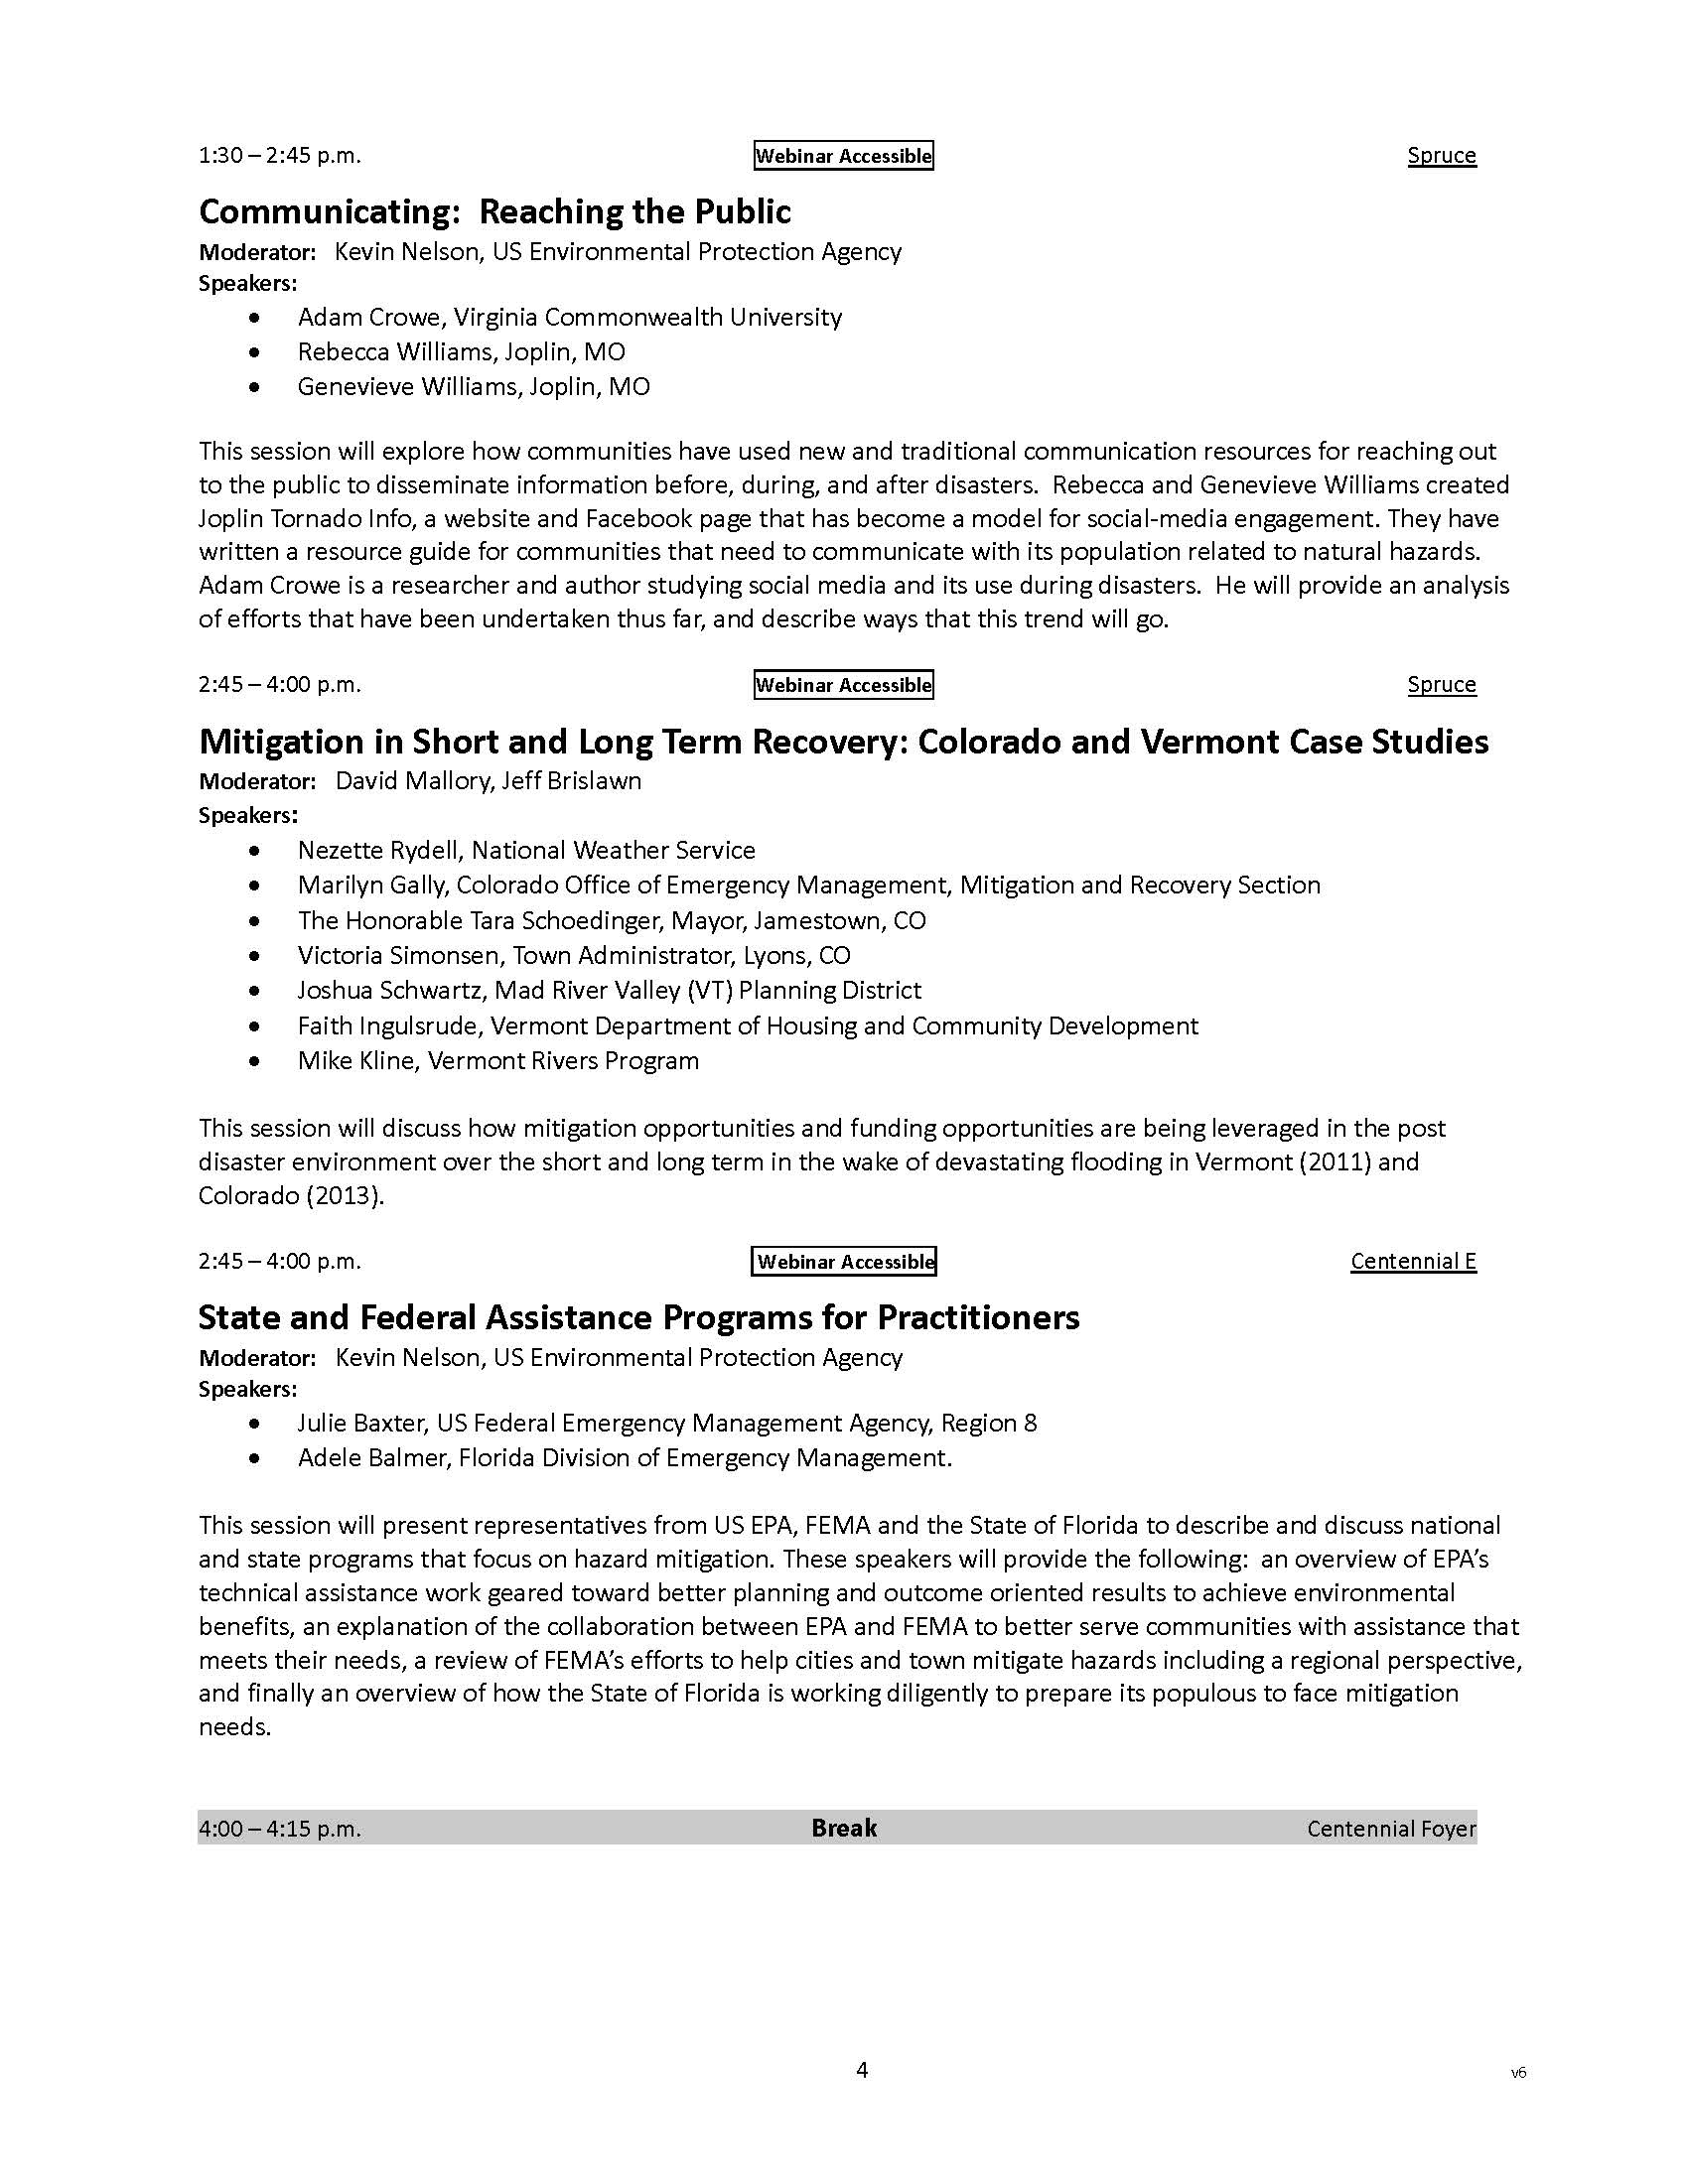 Program Agenda NHMA 2014 Symposium 5-26-14 v6_Page_4